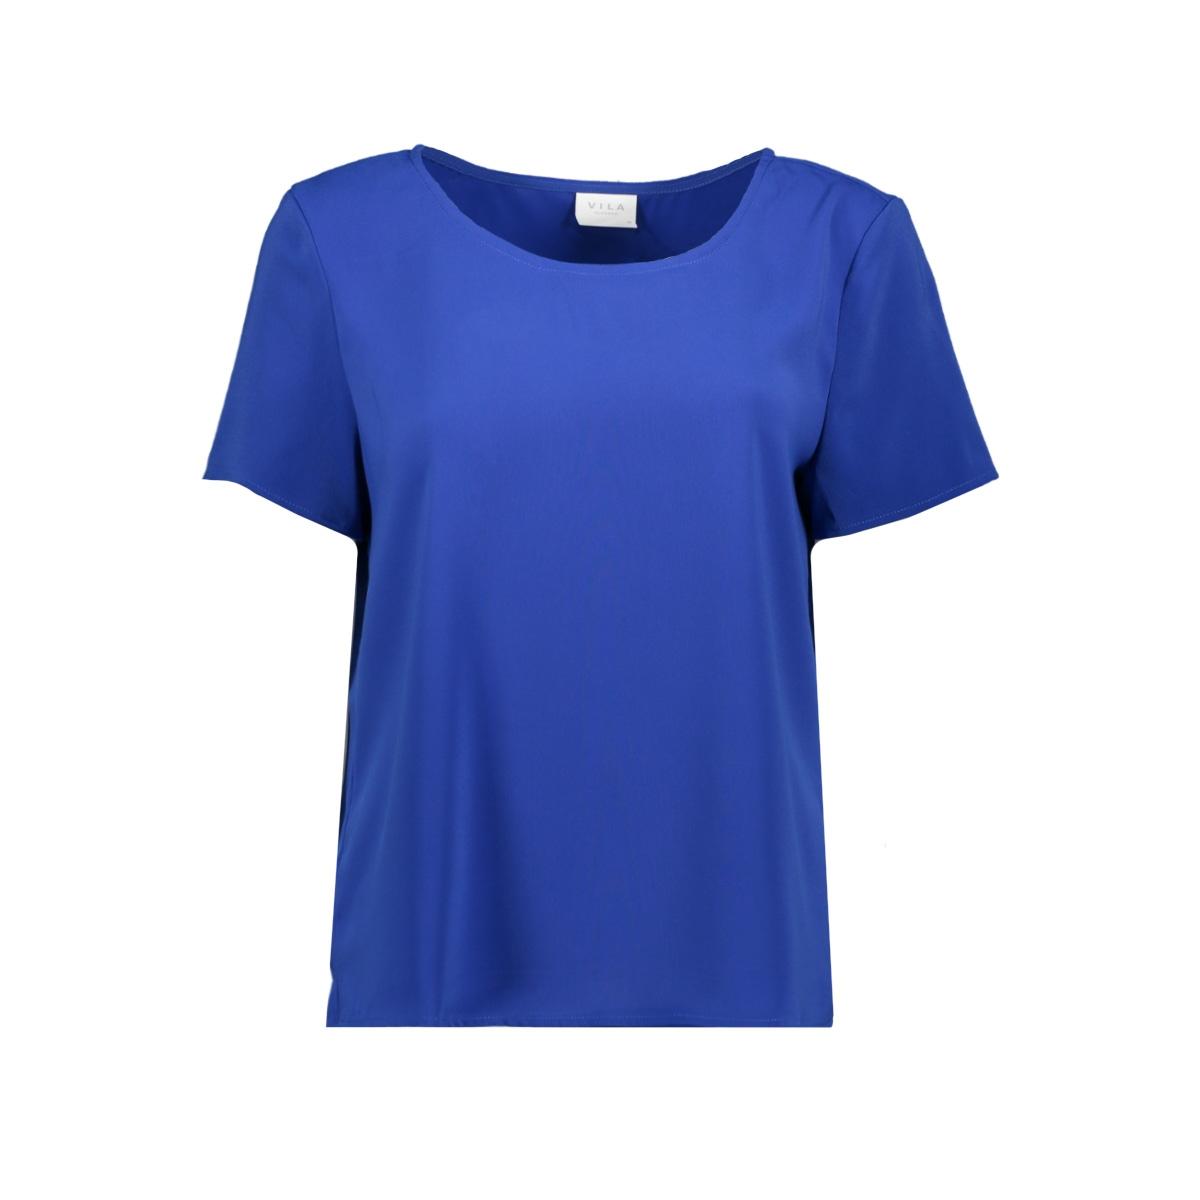 vilaia s/s top - fav 14050338 vila t-shirt surf the web